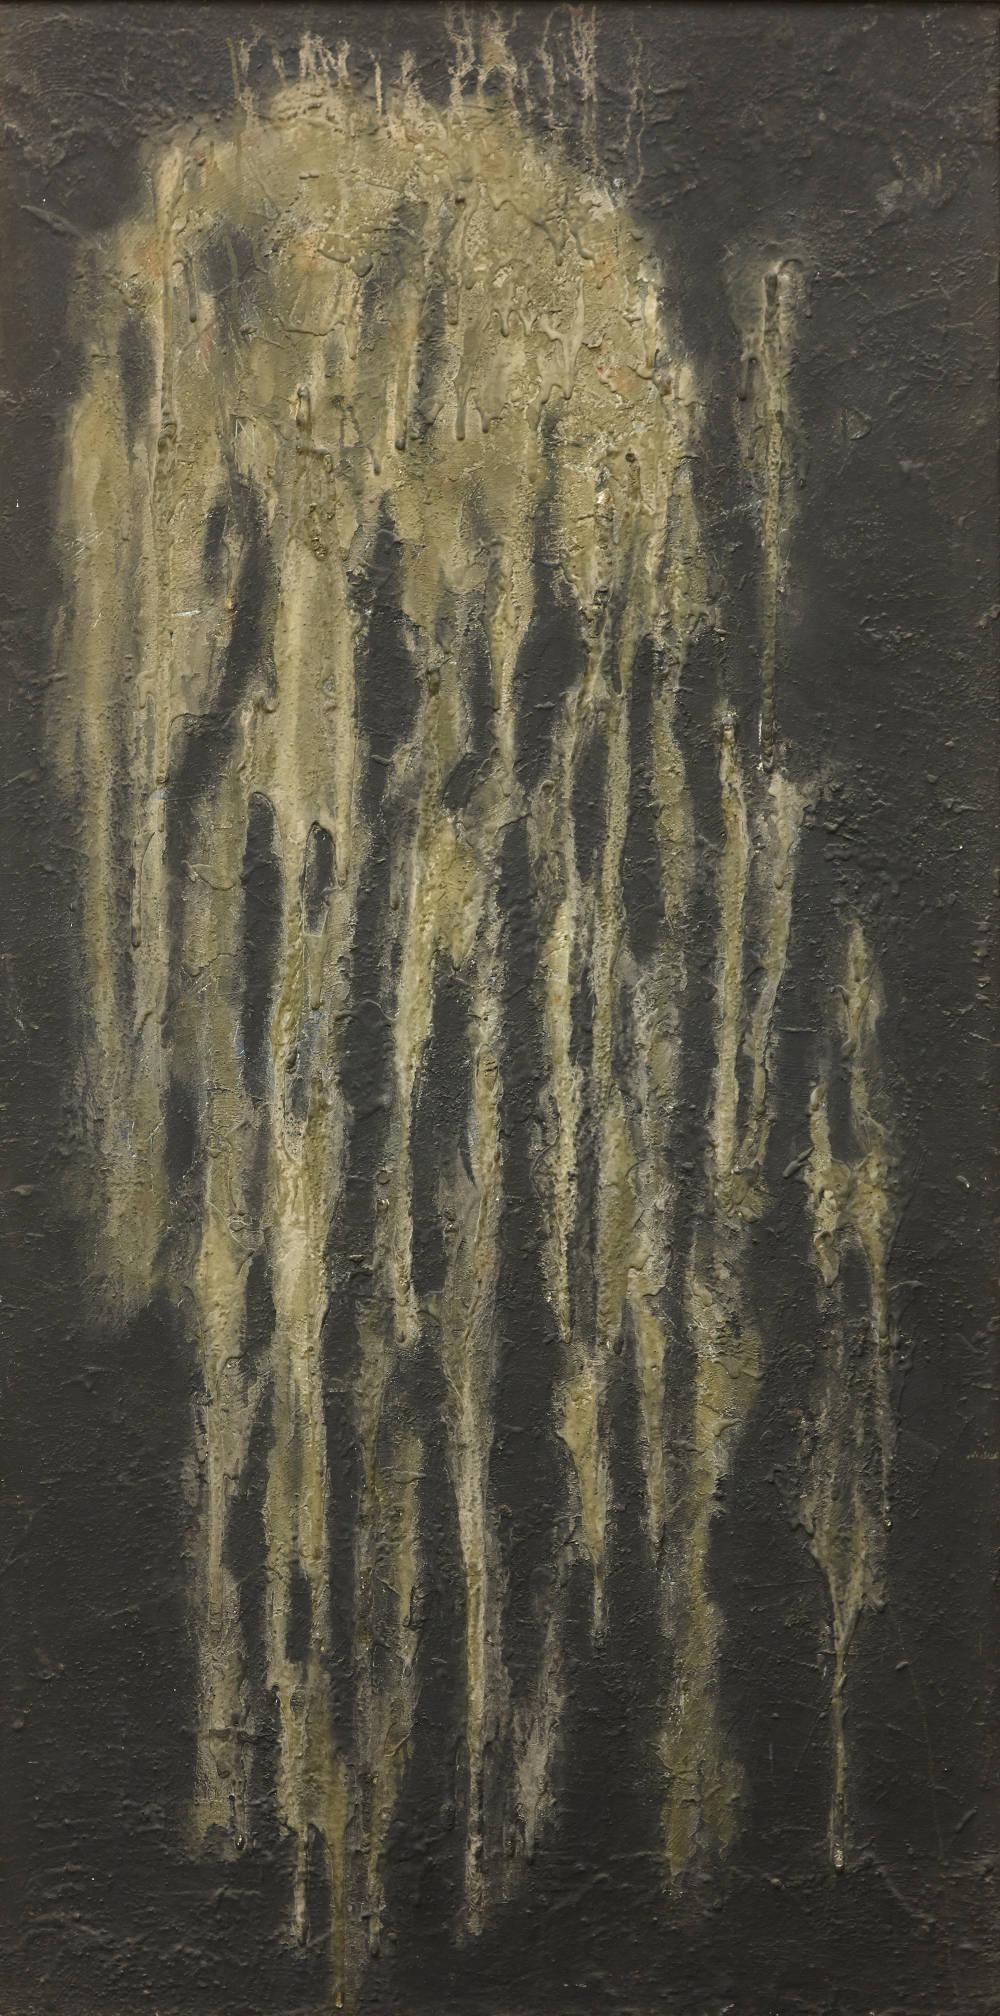 Ryuji Tanaka, Sei (II), 1962-66. Mineral pigment and mixed media on panel 183.5 x 93 cm (72 1/4 x 36 5/8 in.)